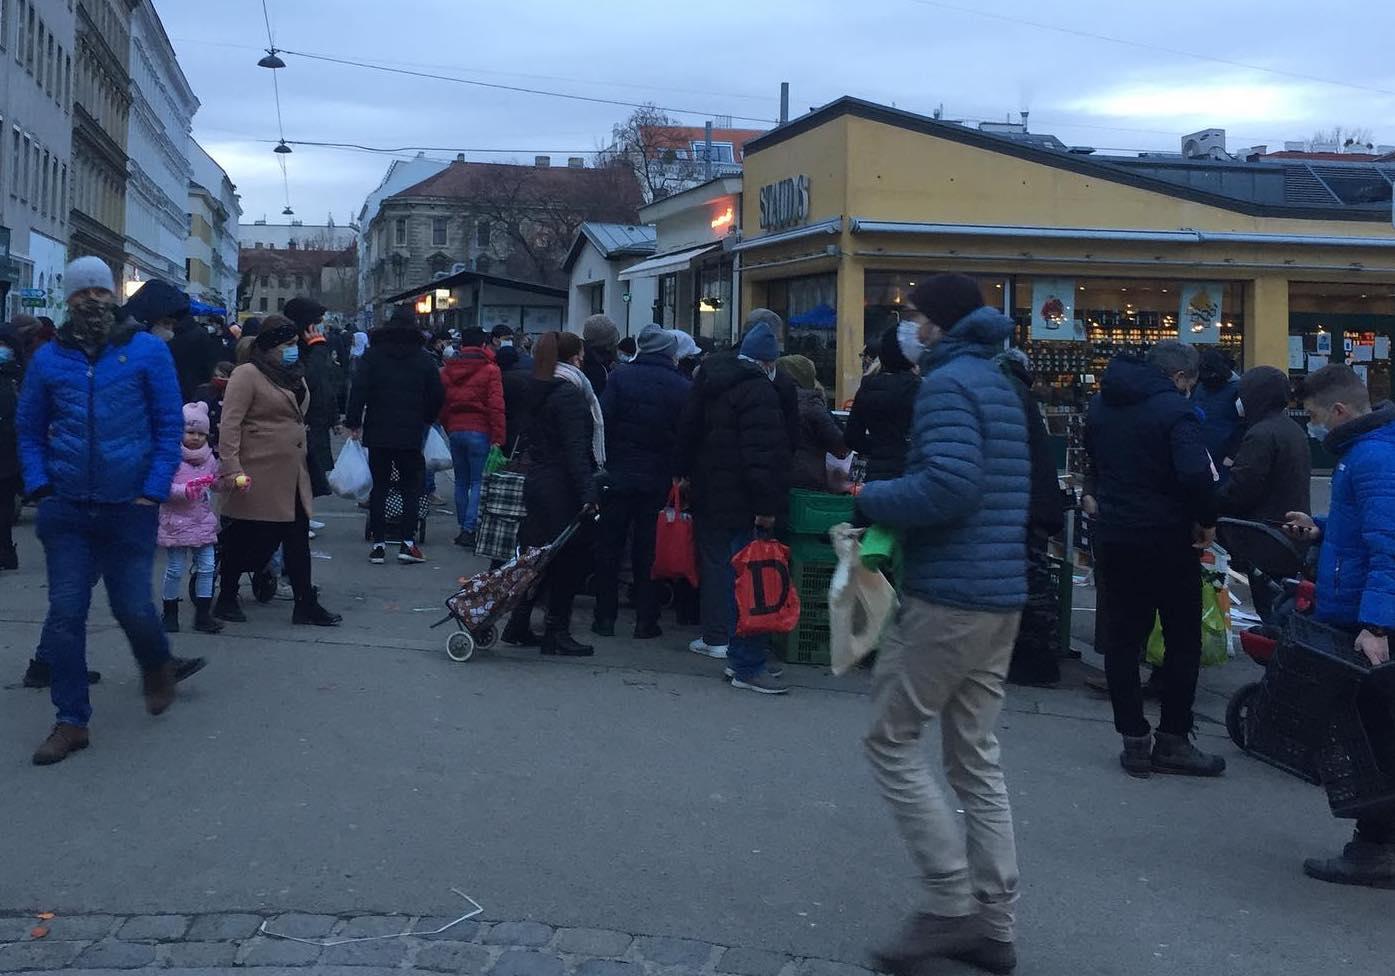 Yppenmarkt